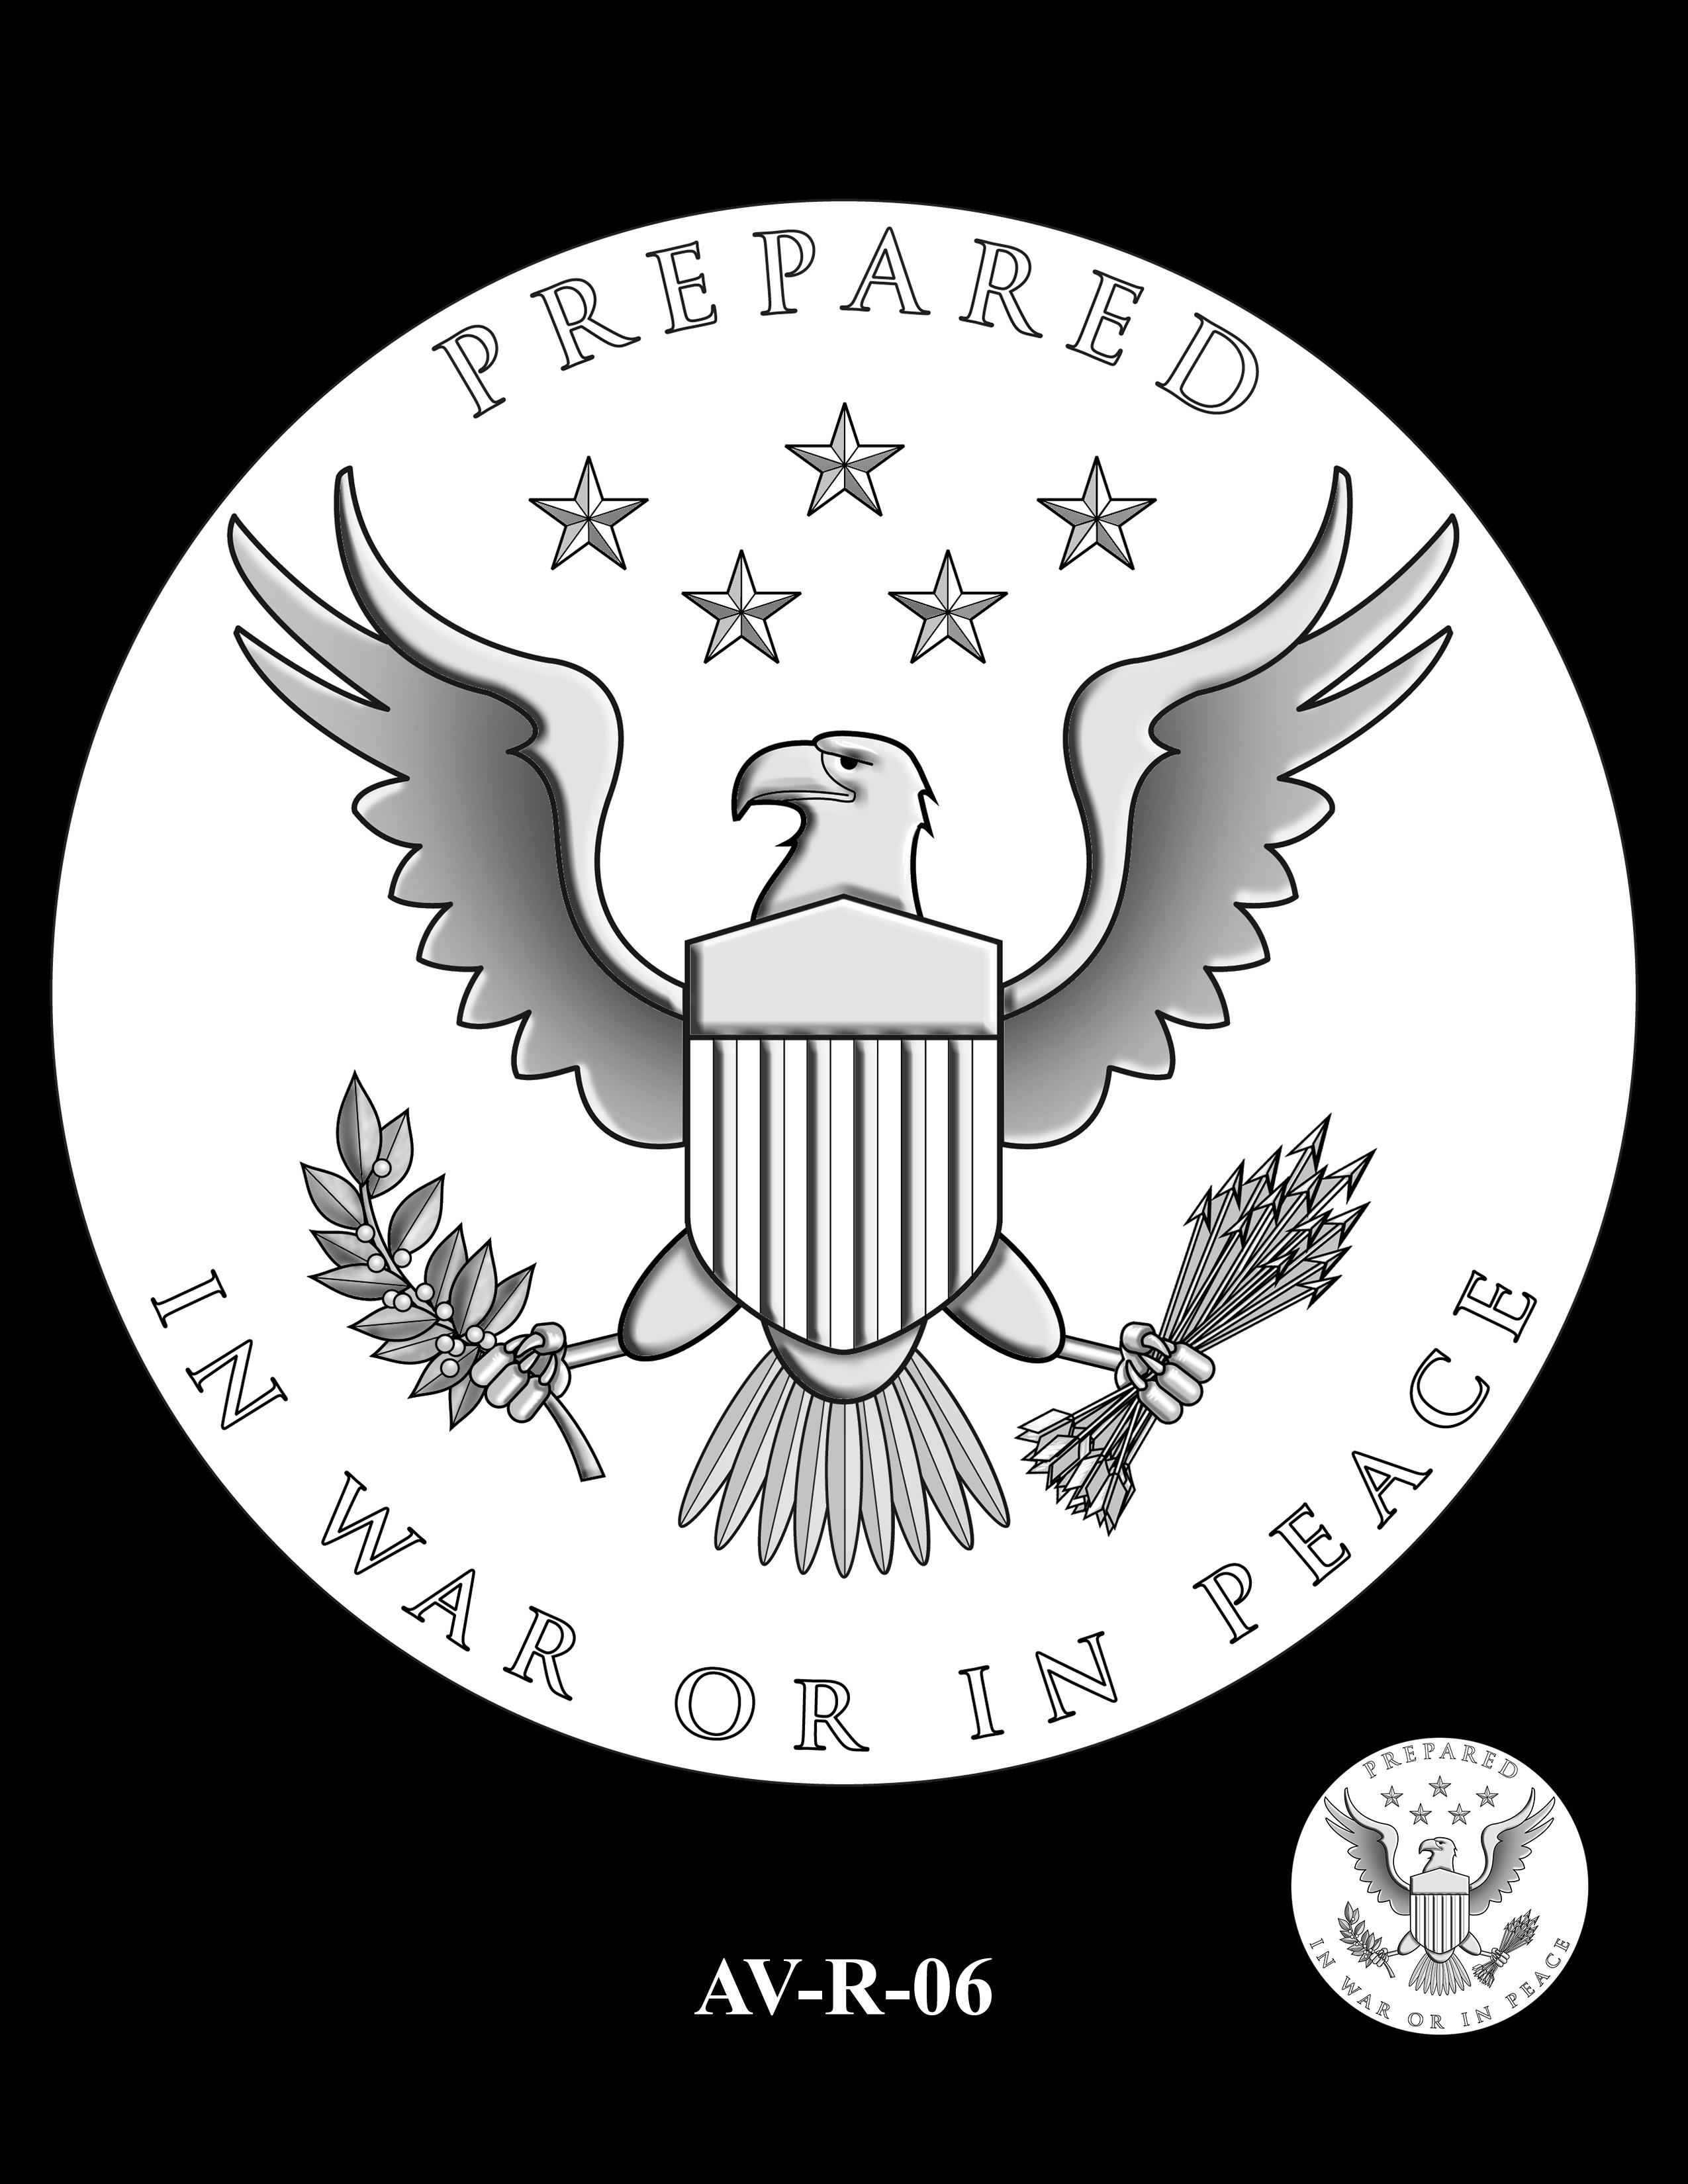 AV-R-06 - American Veterans Medal